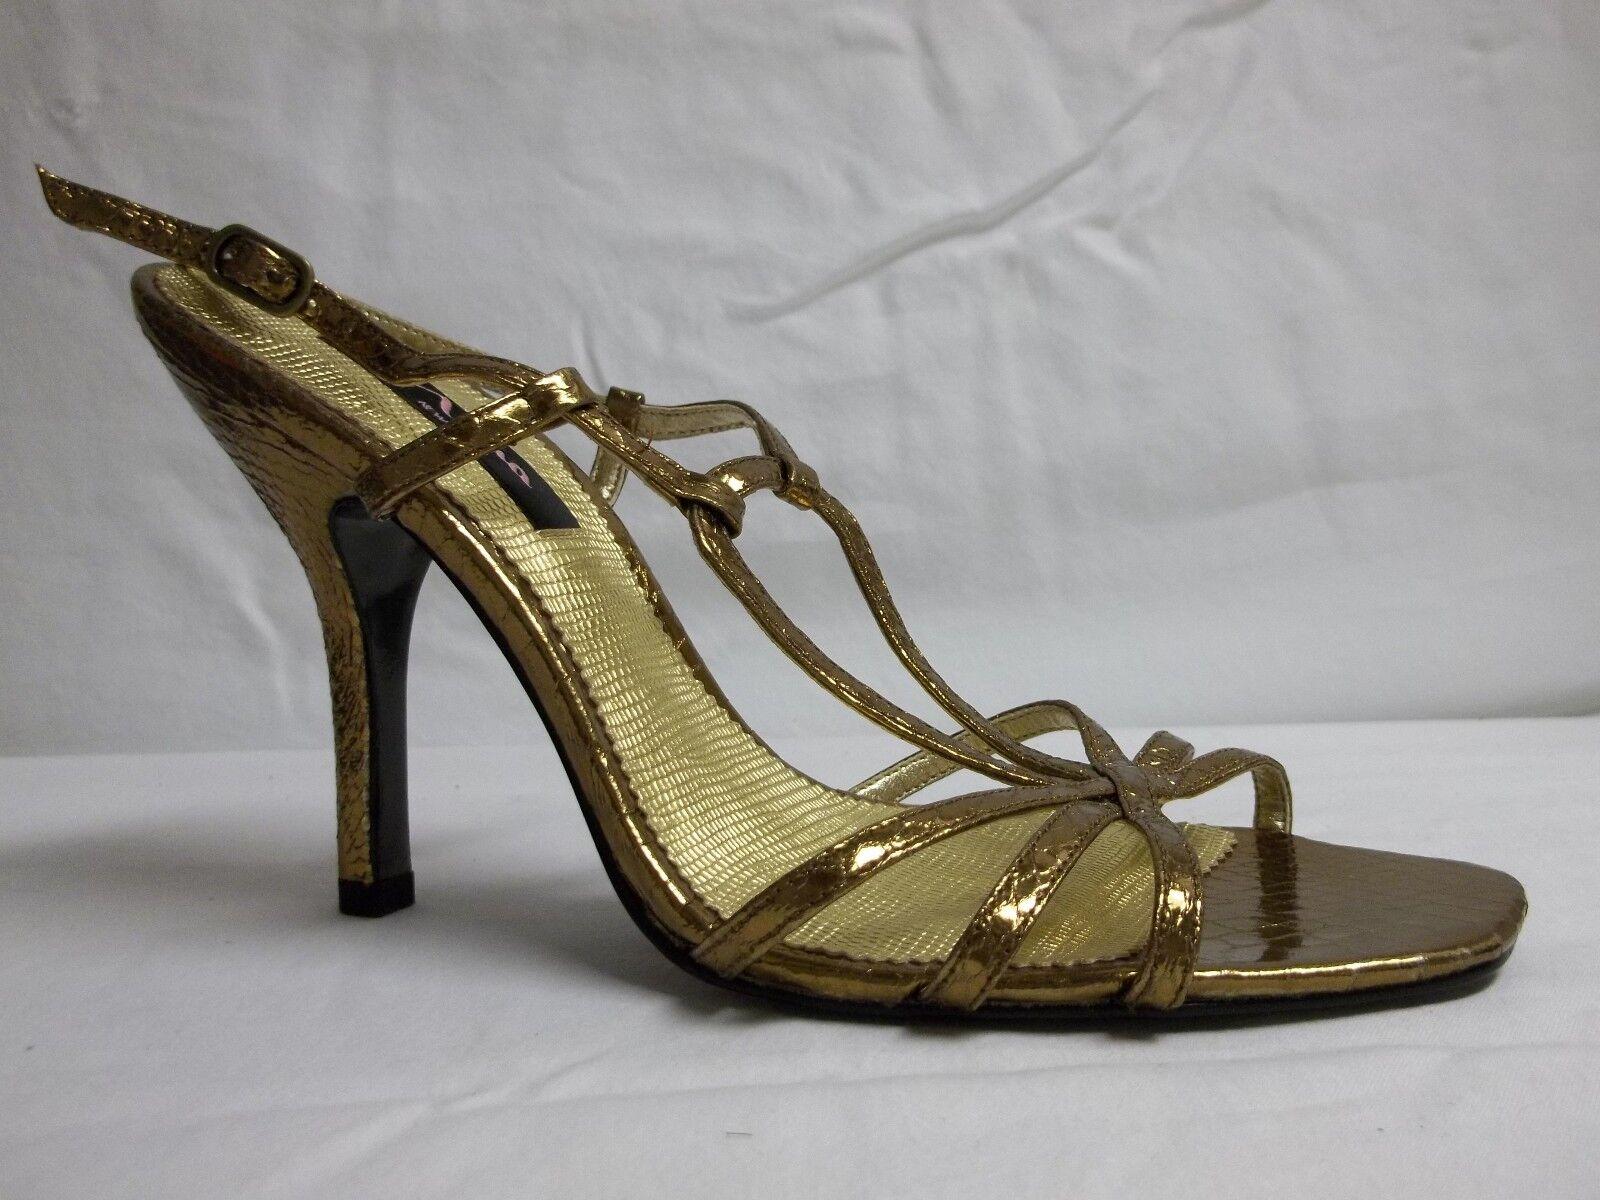 Nina Größe 9.5 M Amazone Bronze Open Toe Slingbacks Heels New Damenschuhe Schuhes NWOB